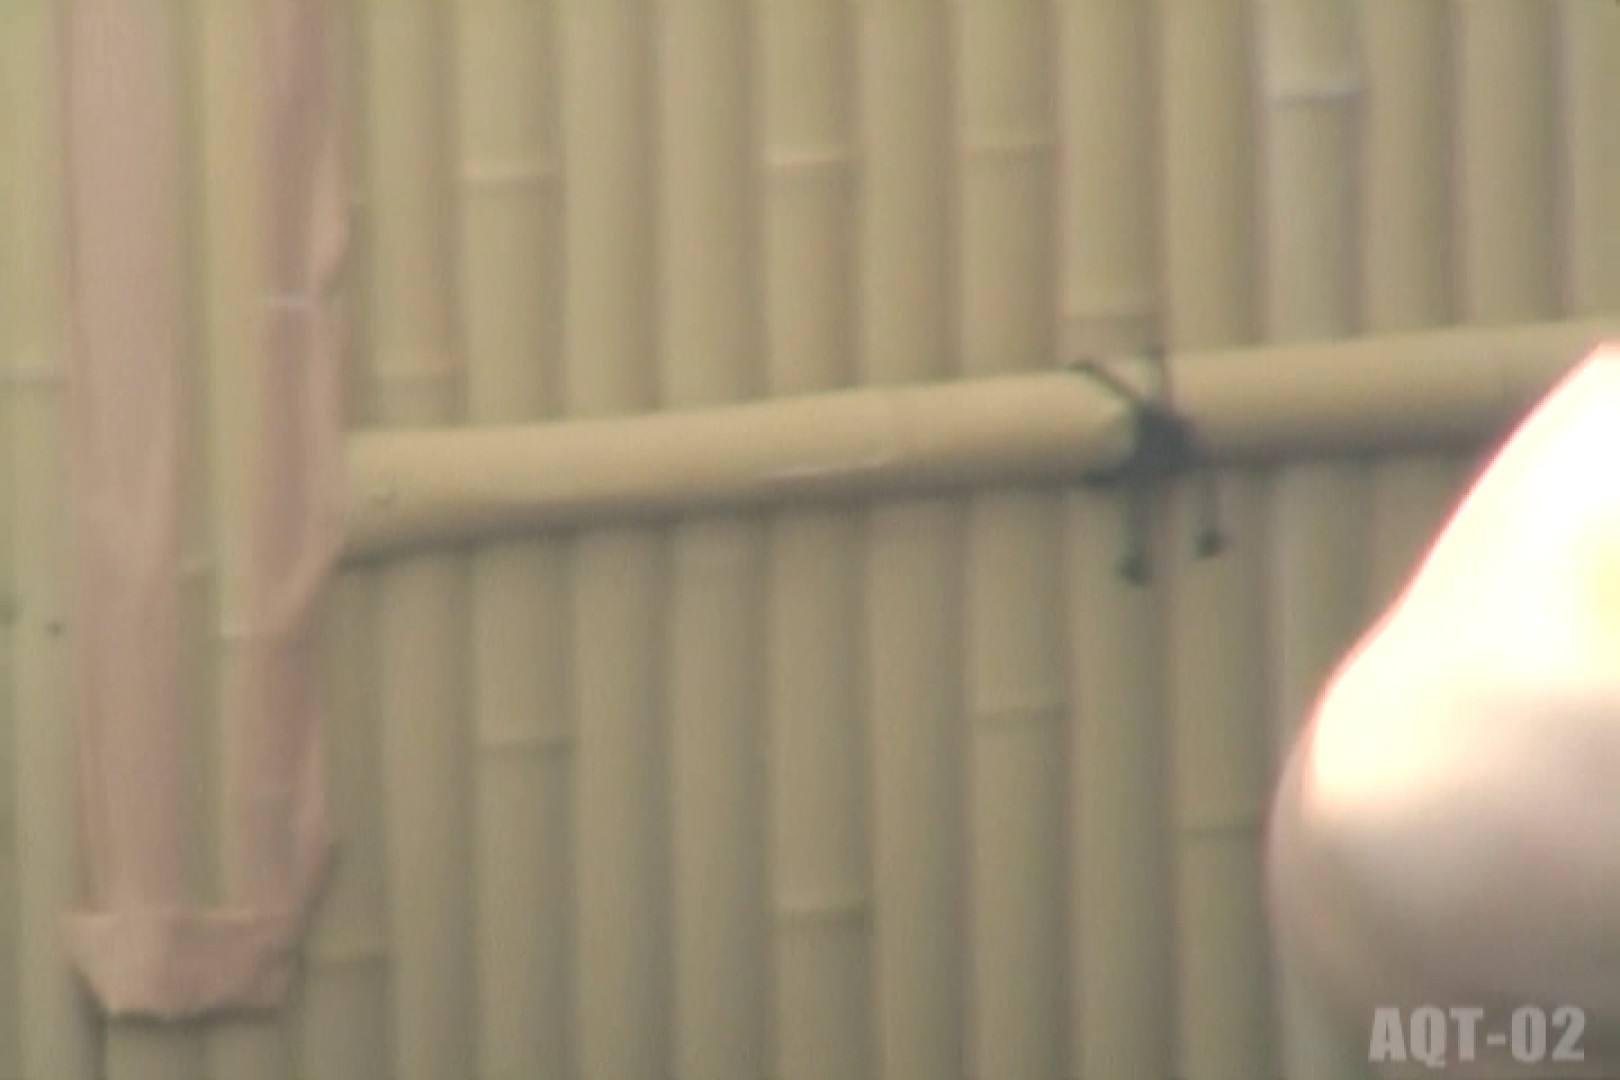 Aquaな露天風呂Vol.726 OLのエロ生活 おまんこ無修正動画無料 84連発 17